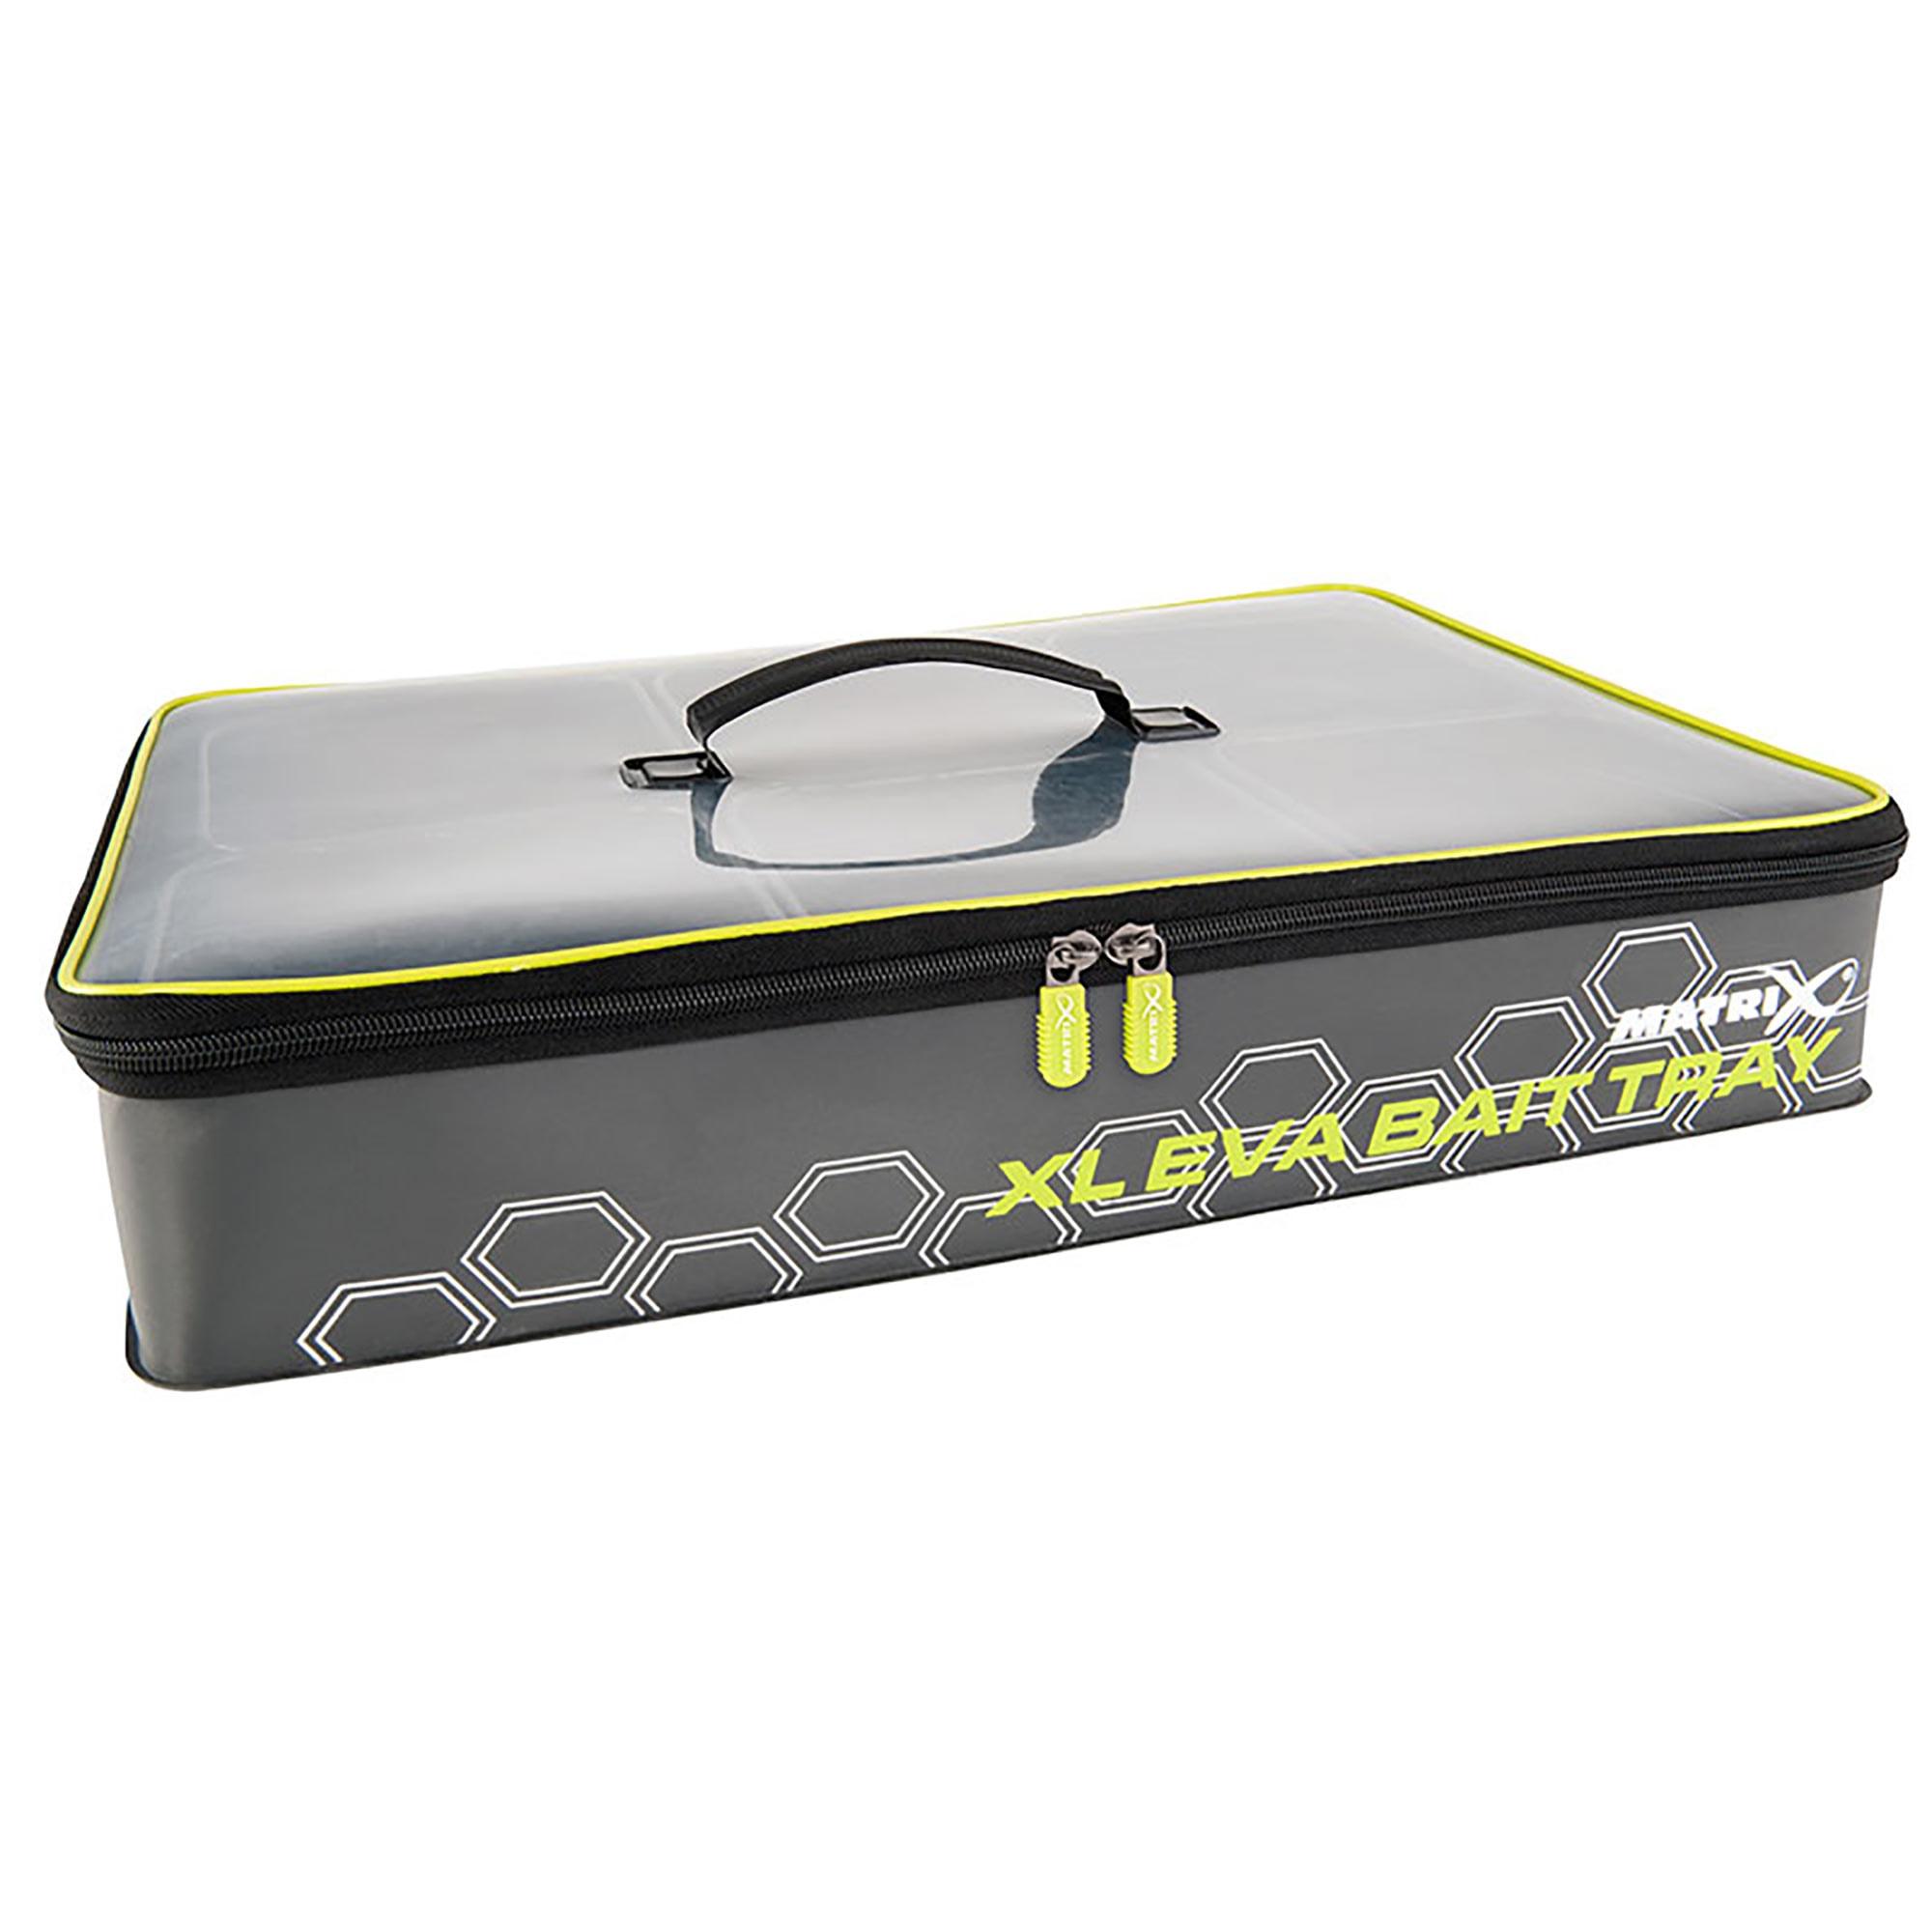 Set Pastura EVA XL Bait Tray 6 tubs - MATRIX (53x37x9,5 cm)